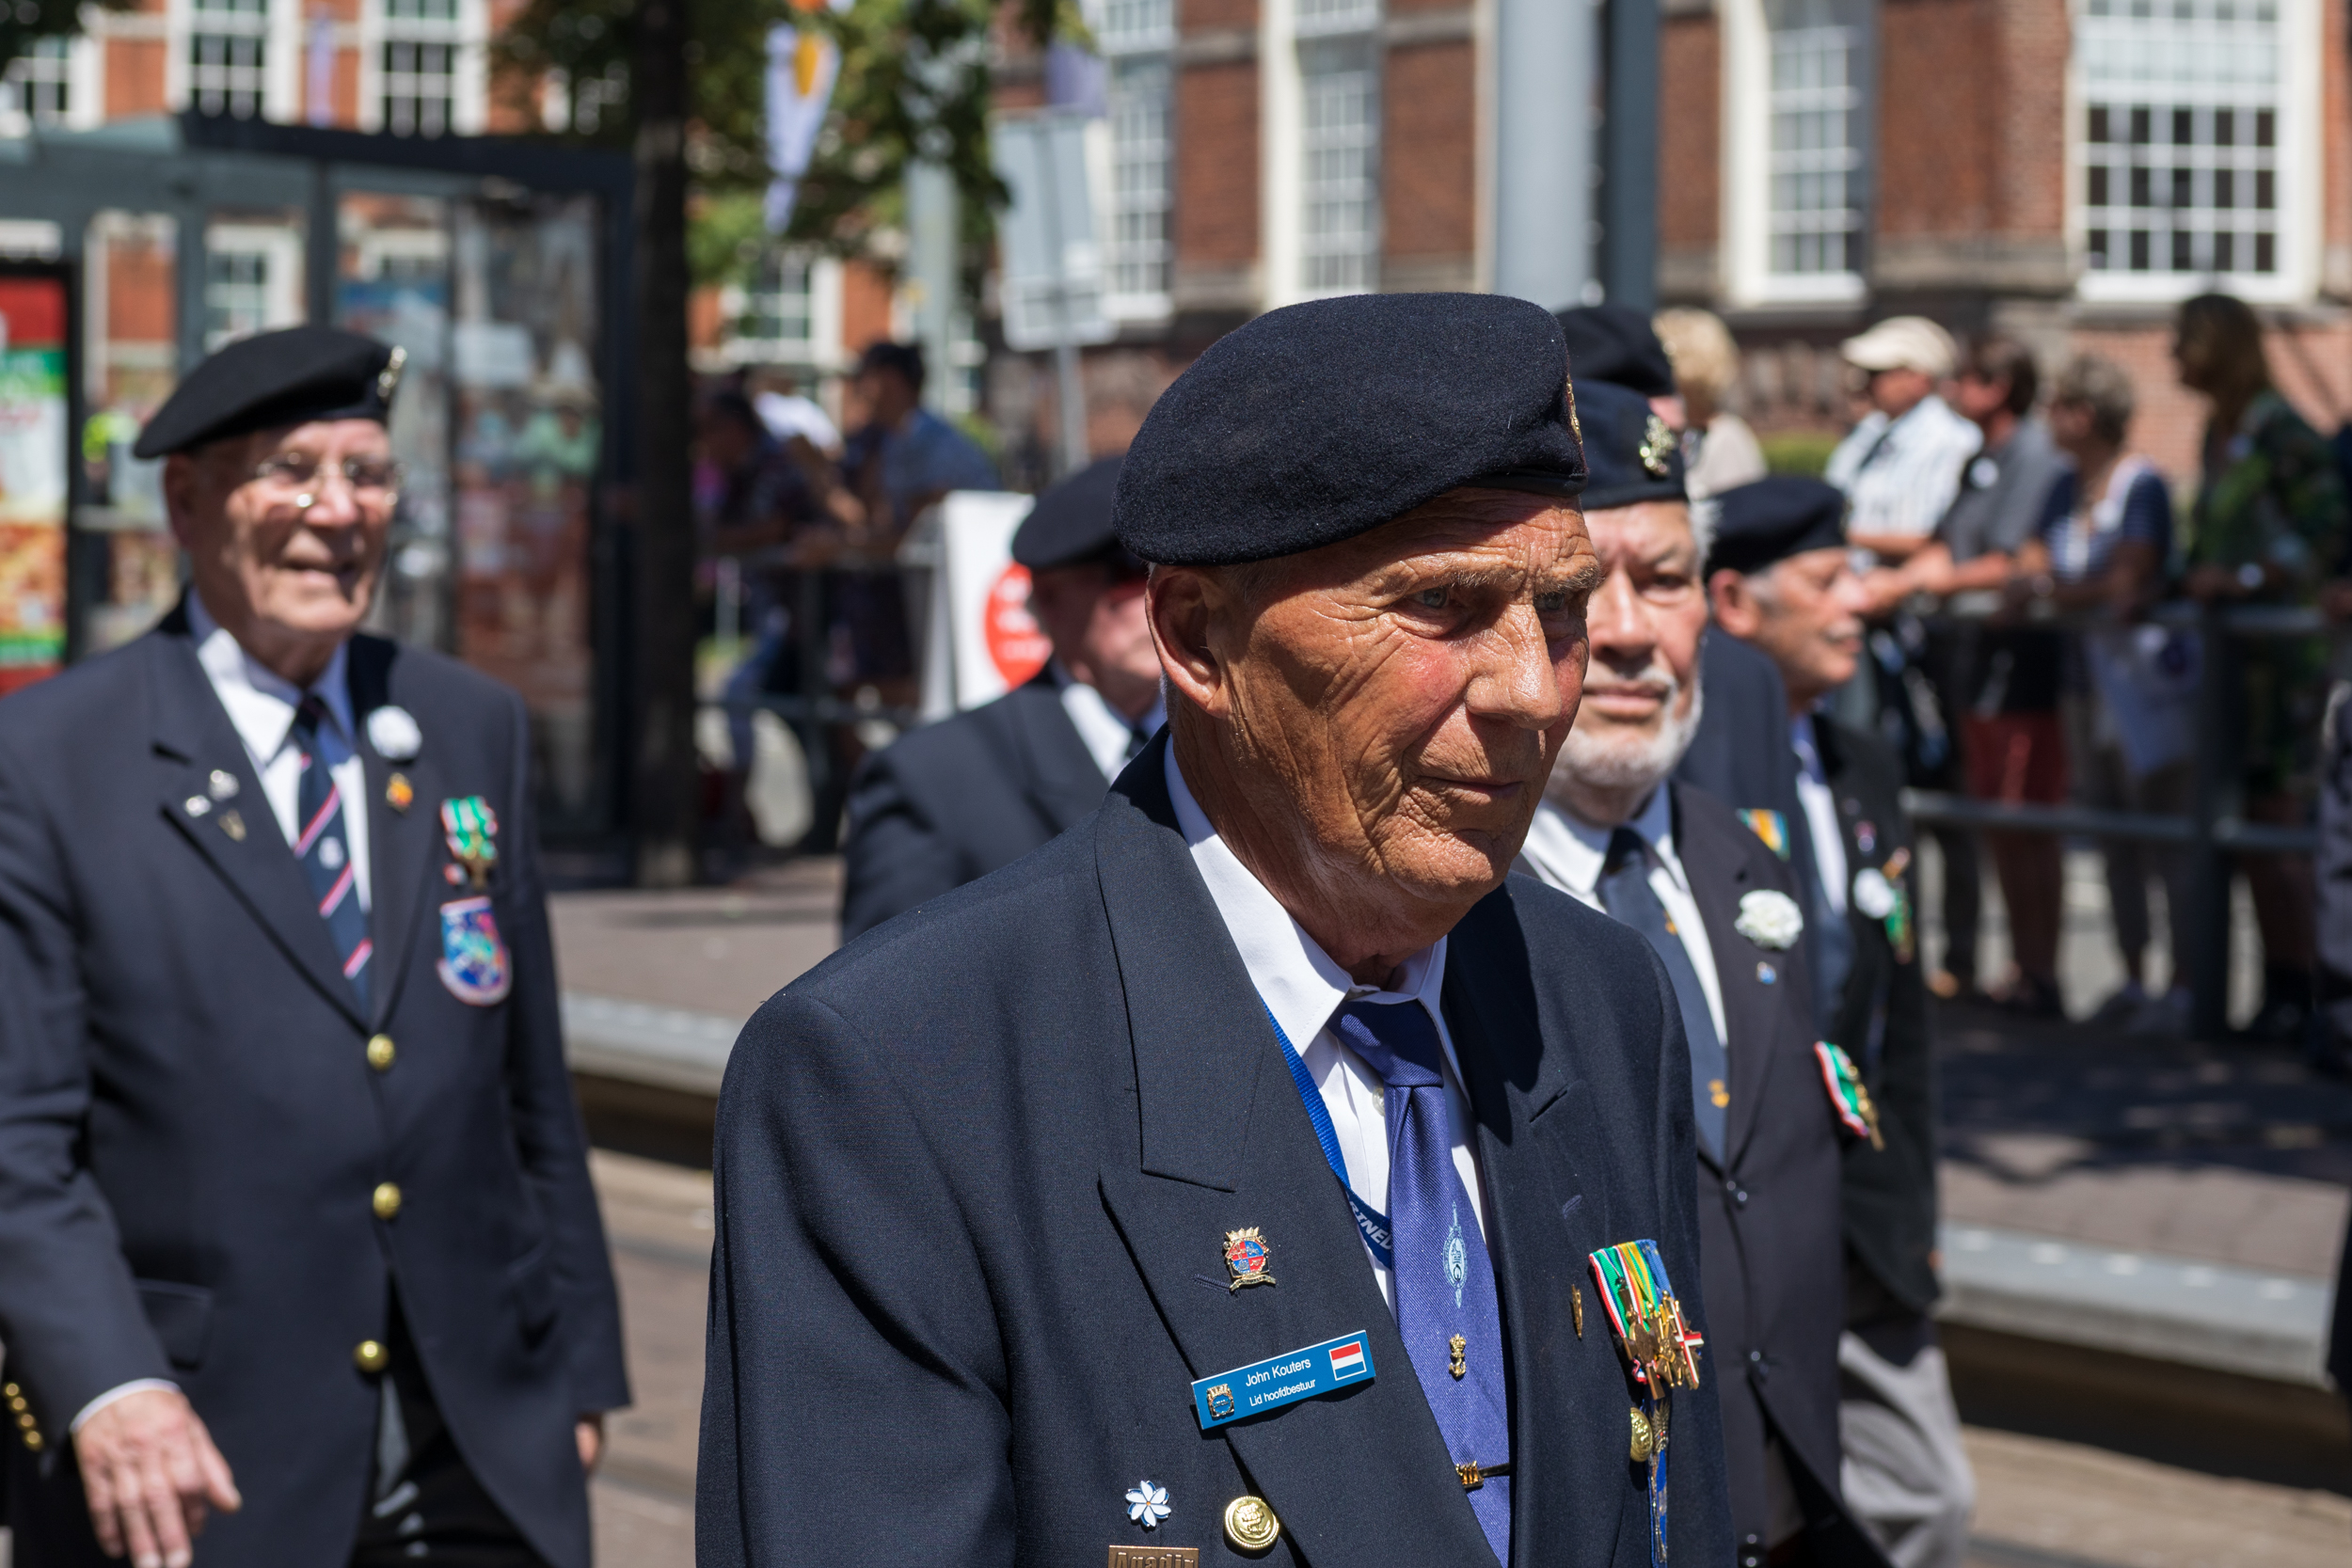 Veteranendag 2019 Kneuterdijk-7.jpg